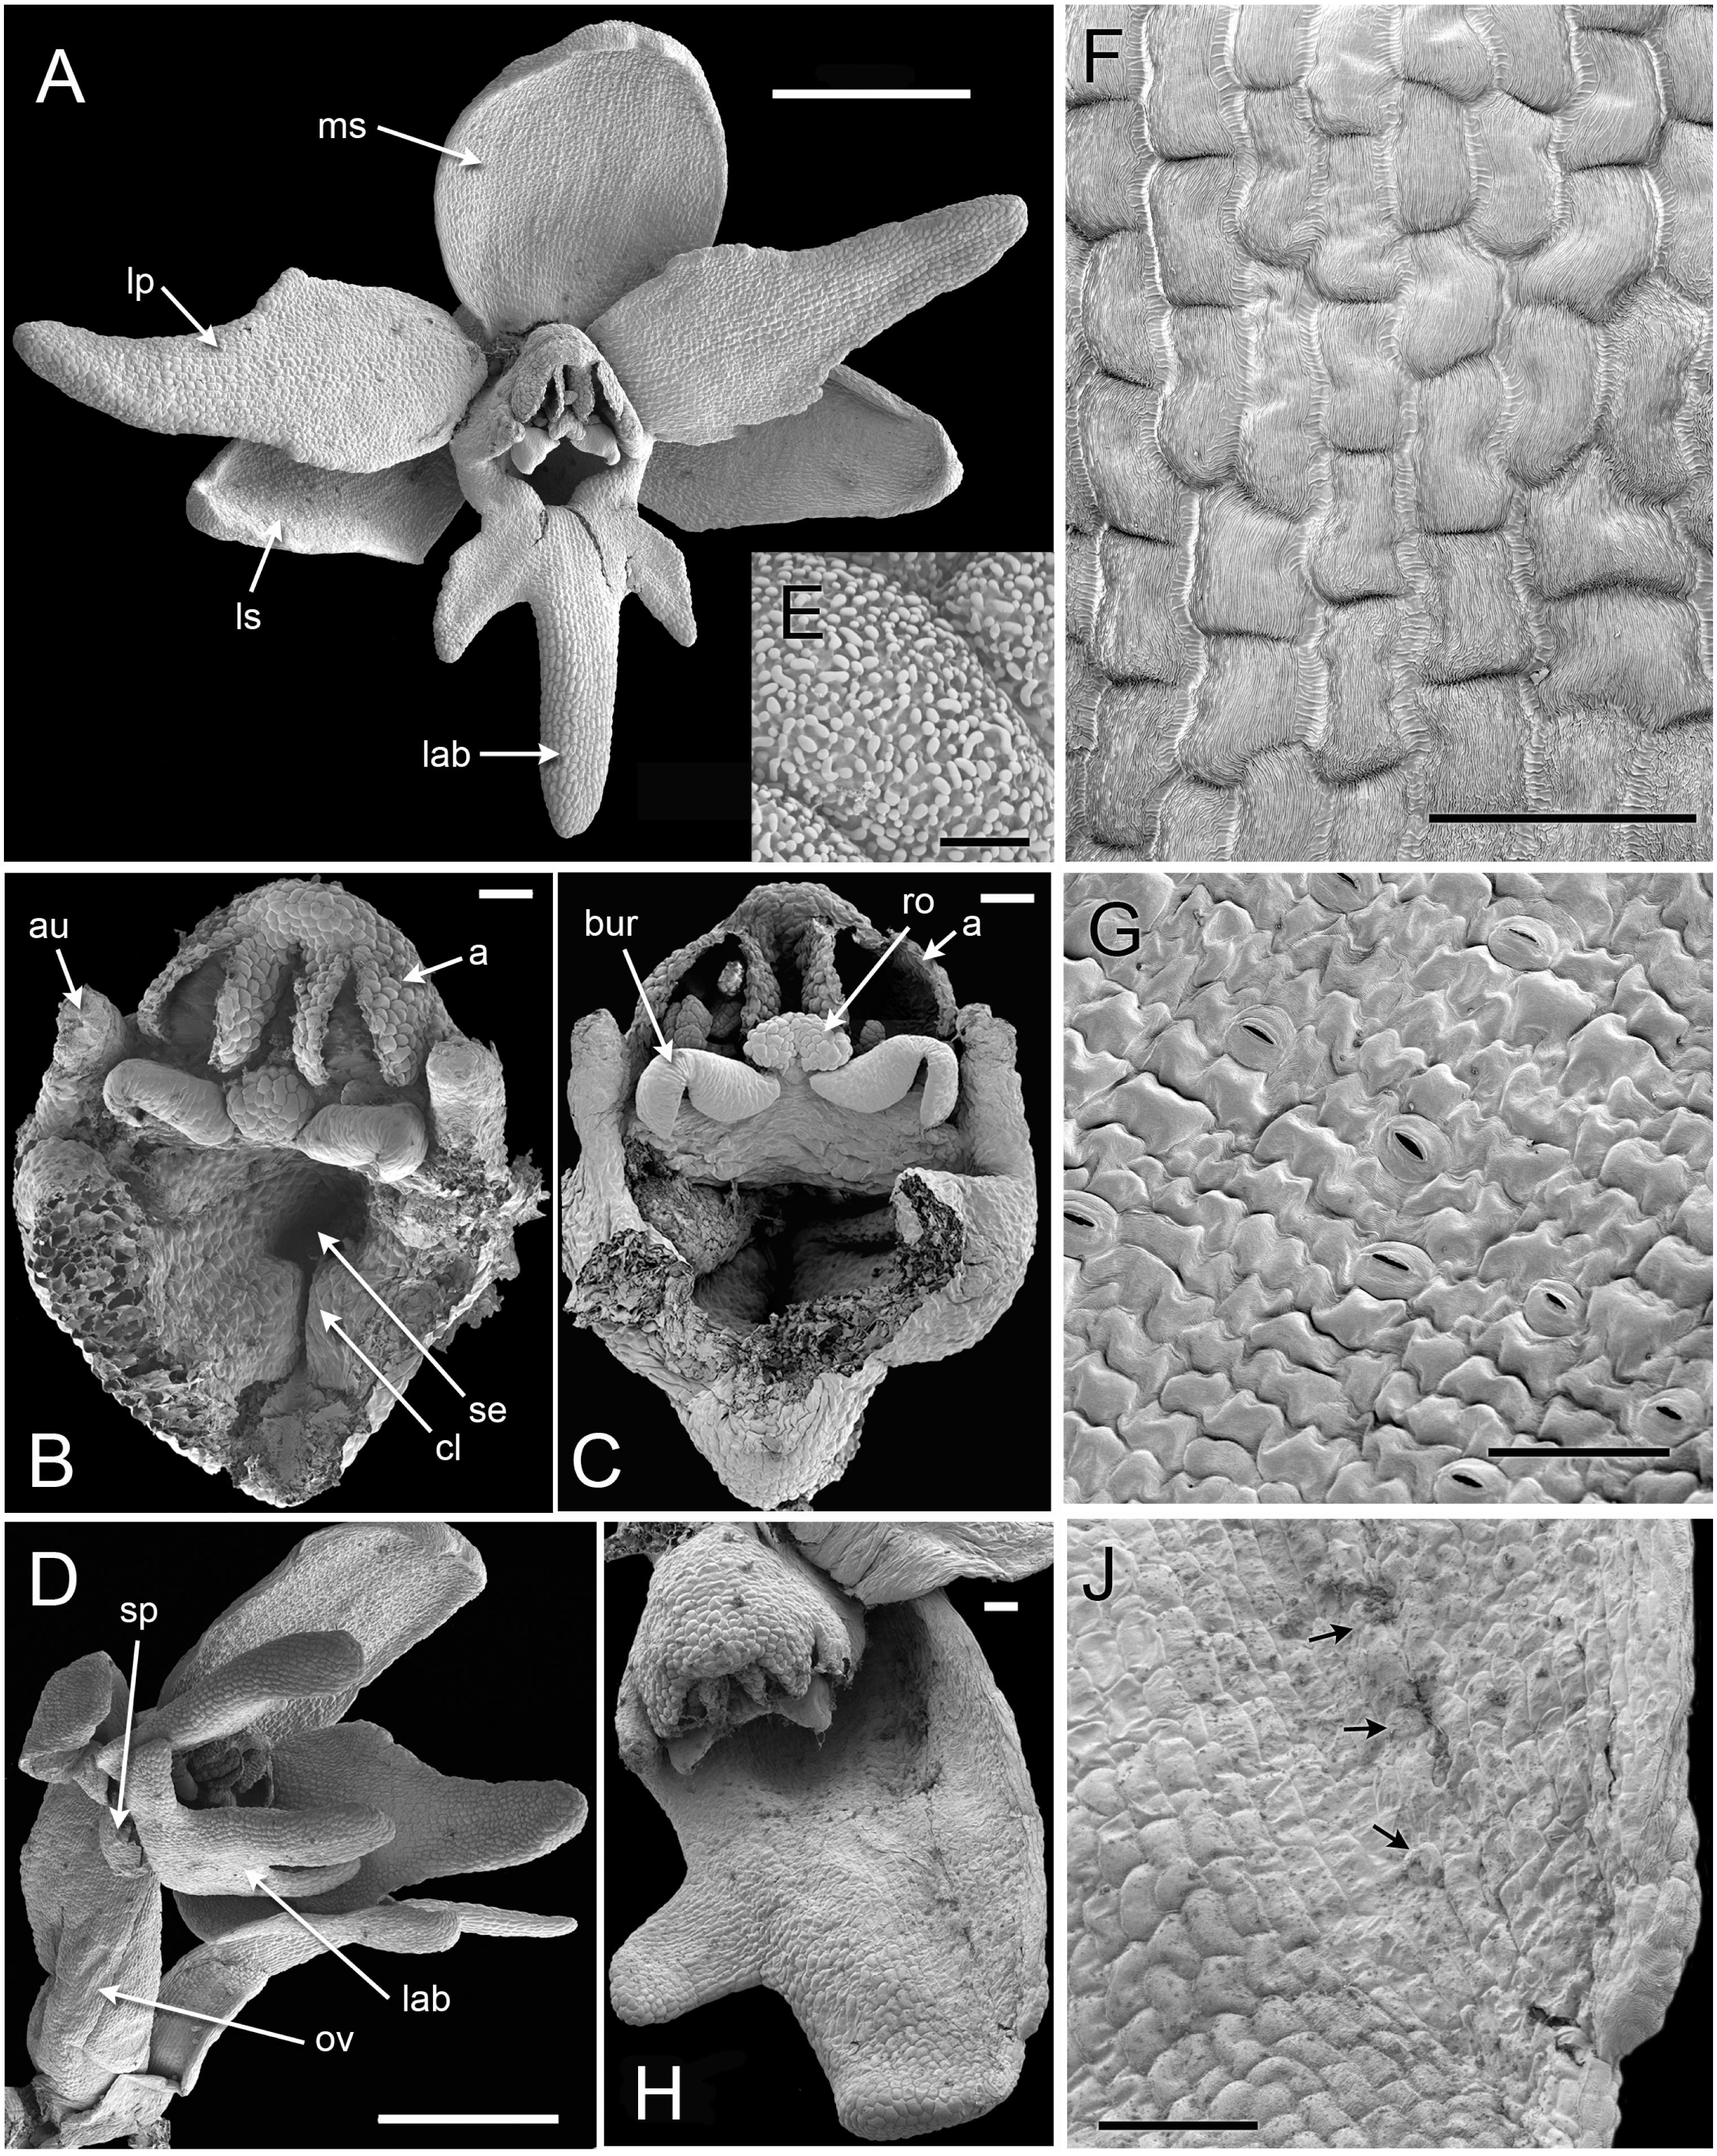 Organ homologies in orchid flowers re-interpreted using the Musk ...